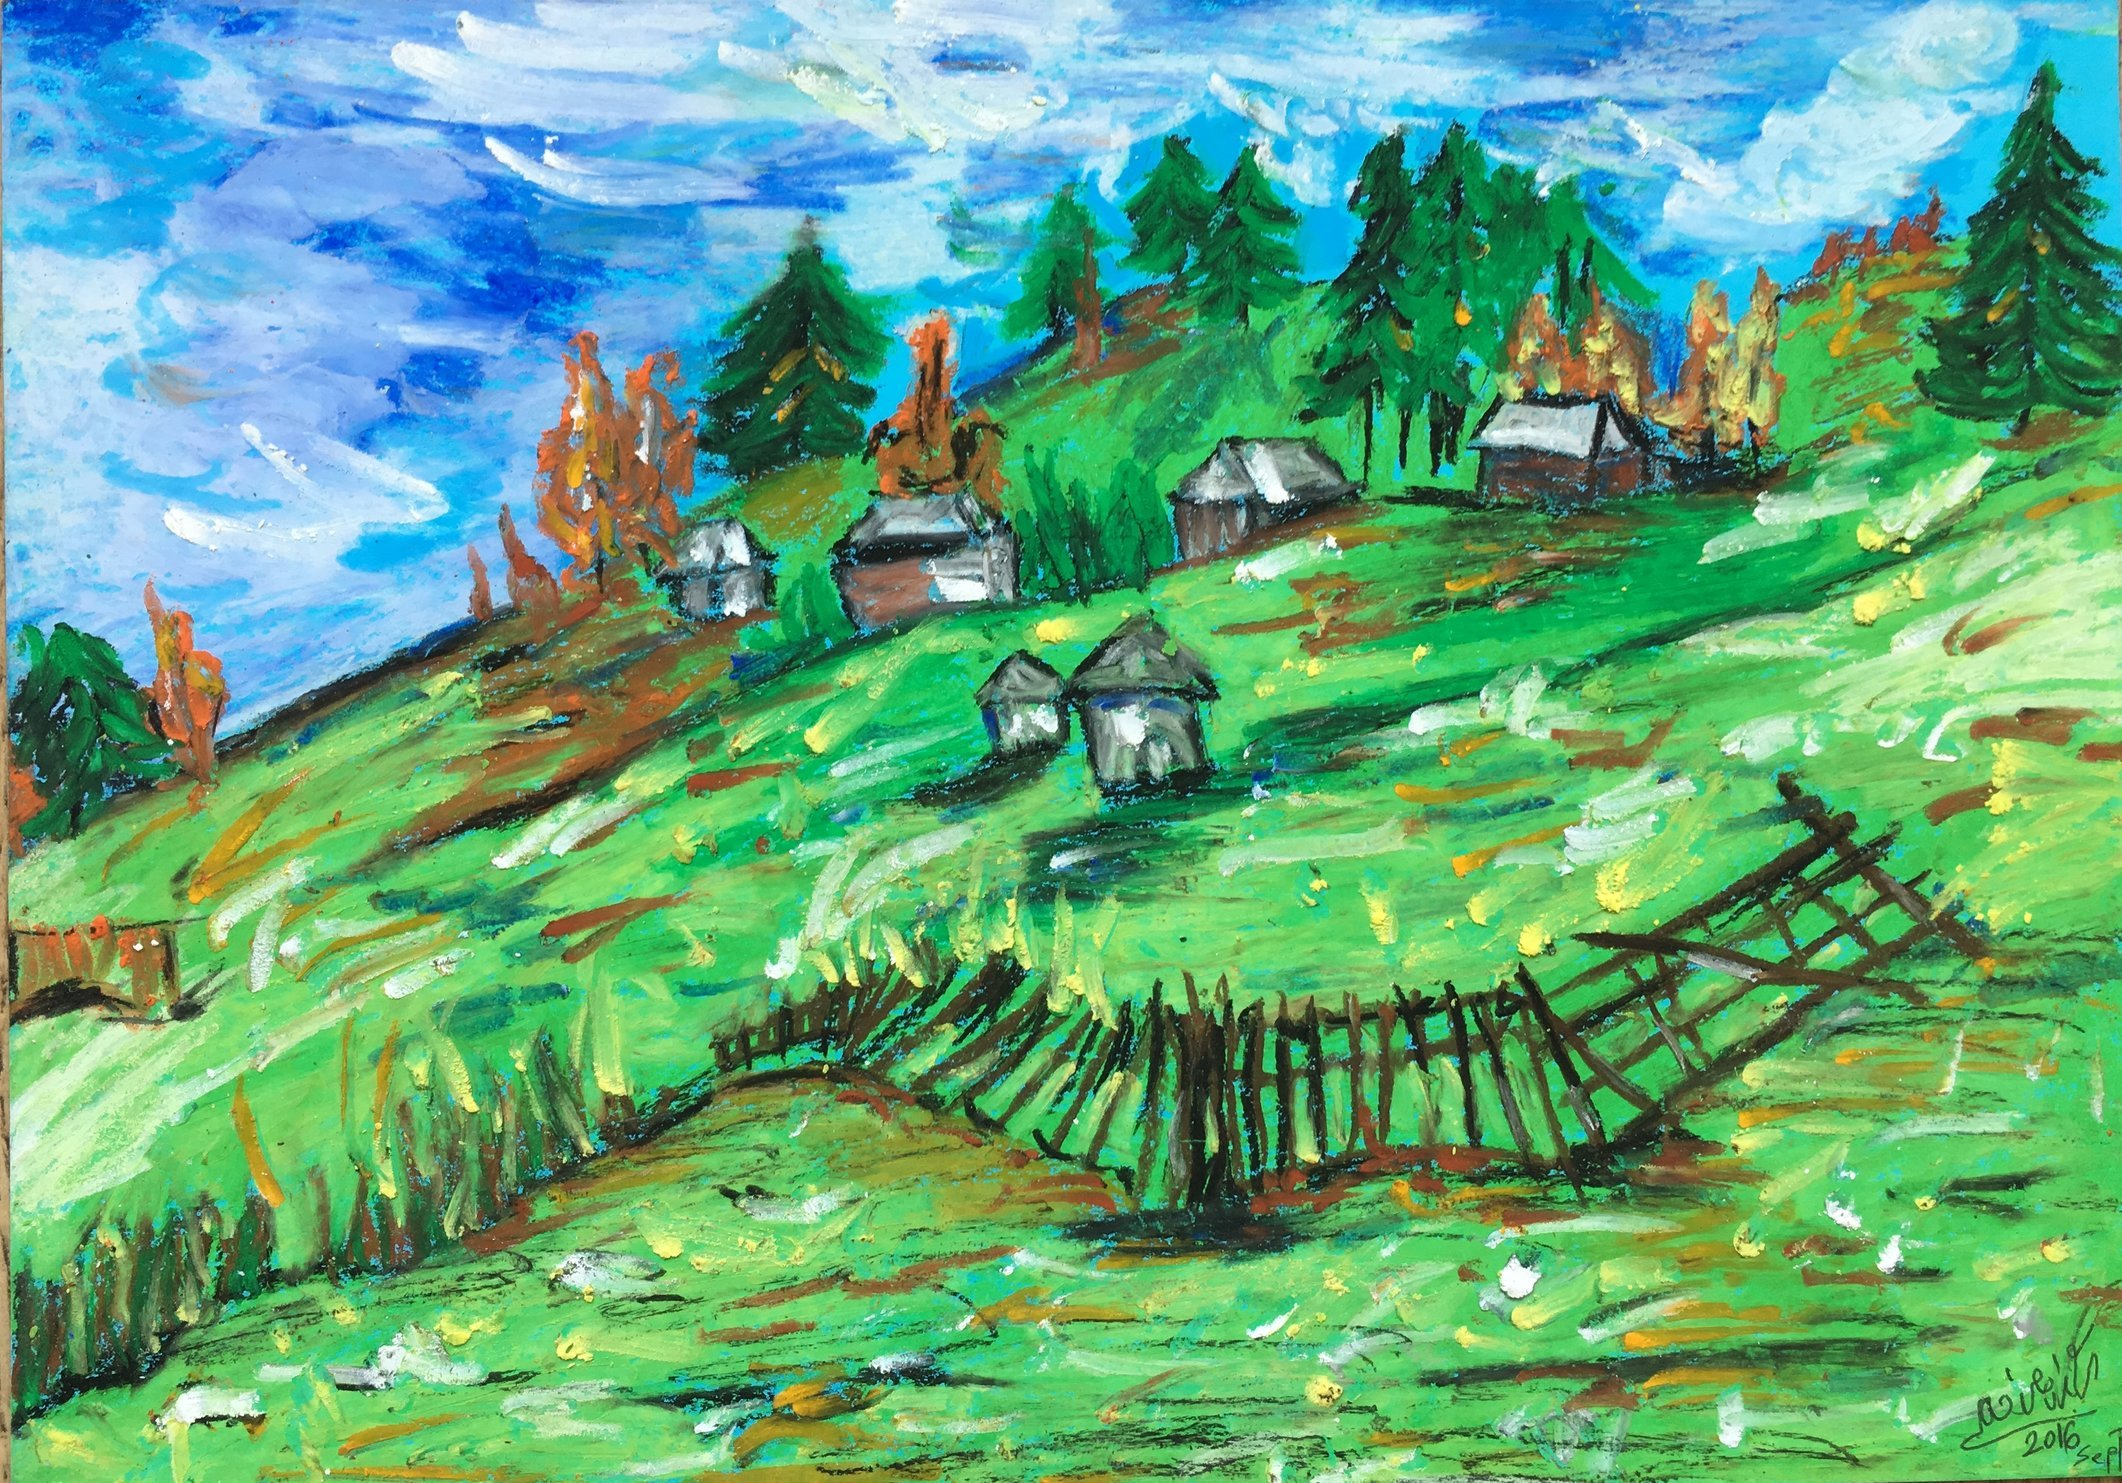 Transylvanian Landscape 2